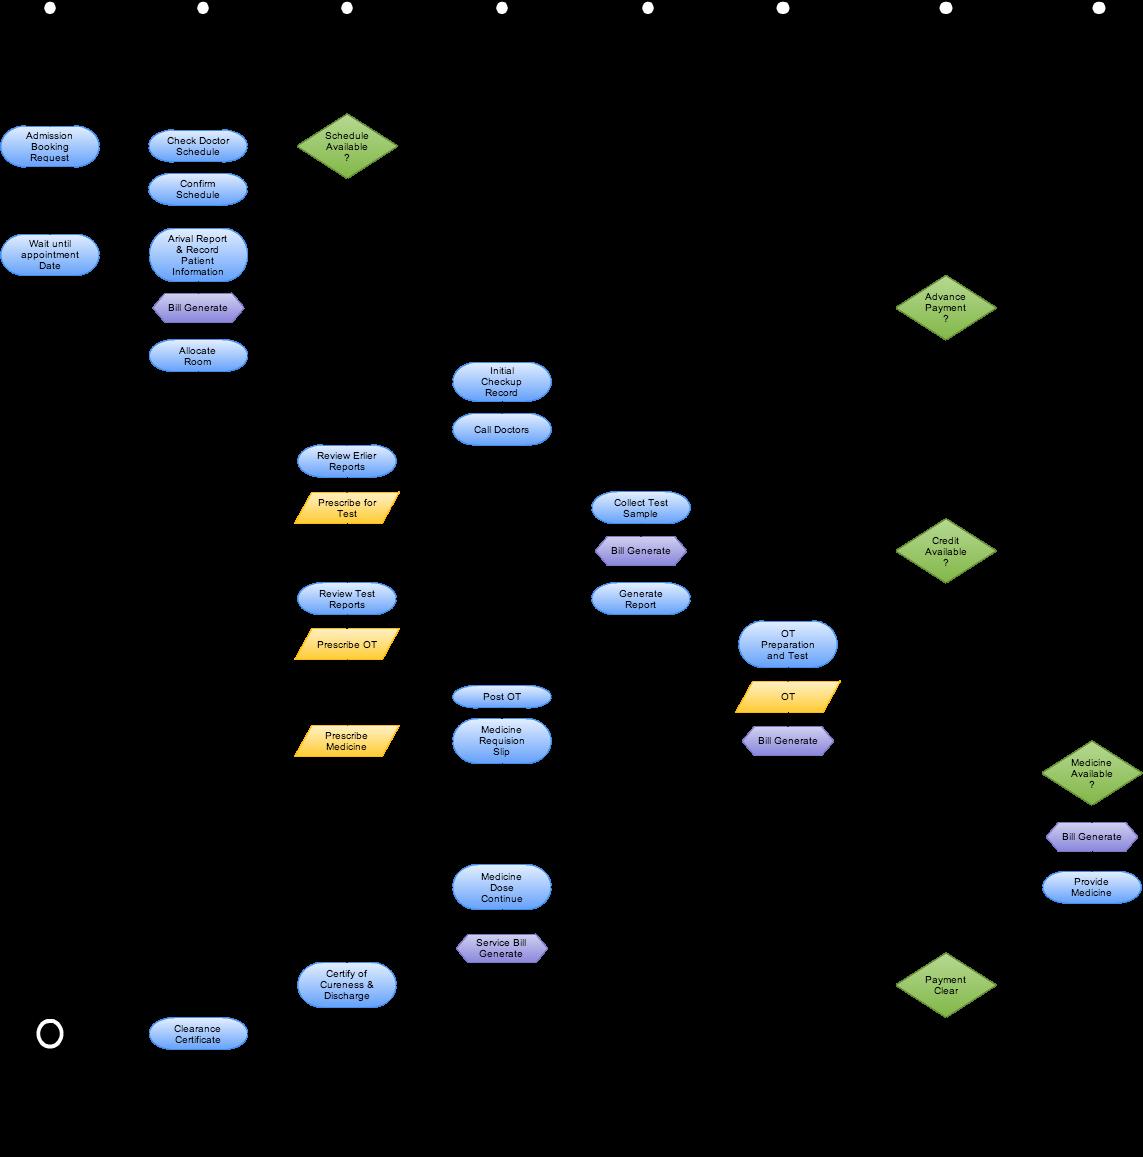 cloud-hospital-erp